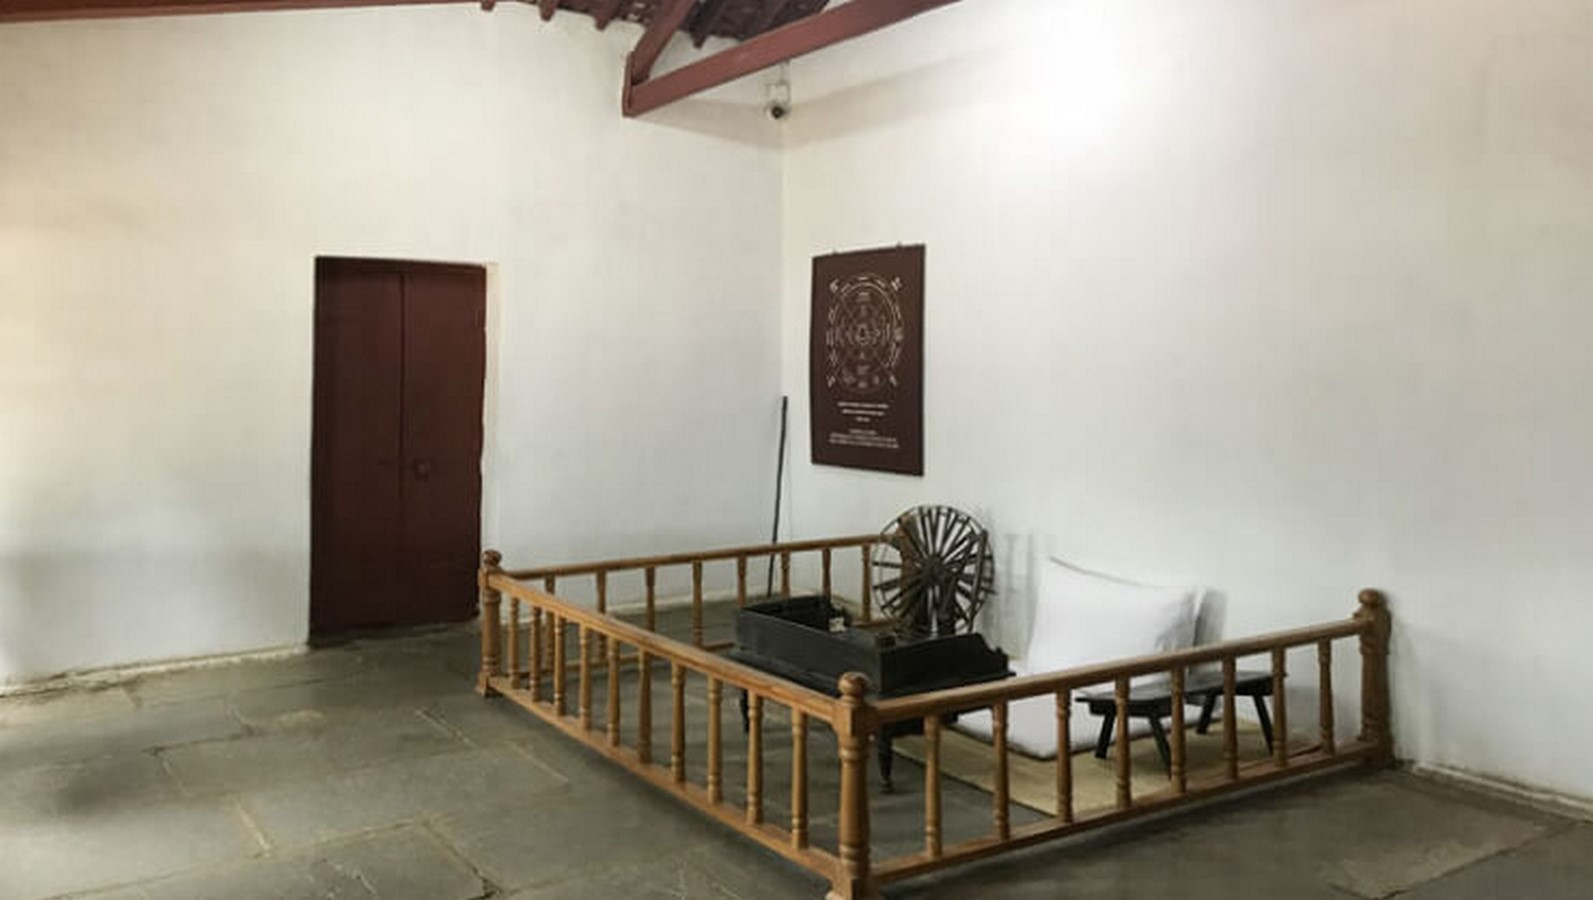 Gandhian Ideology In Architecture - Sheet5